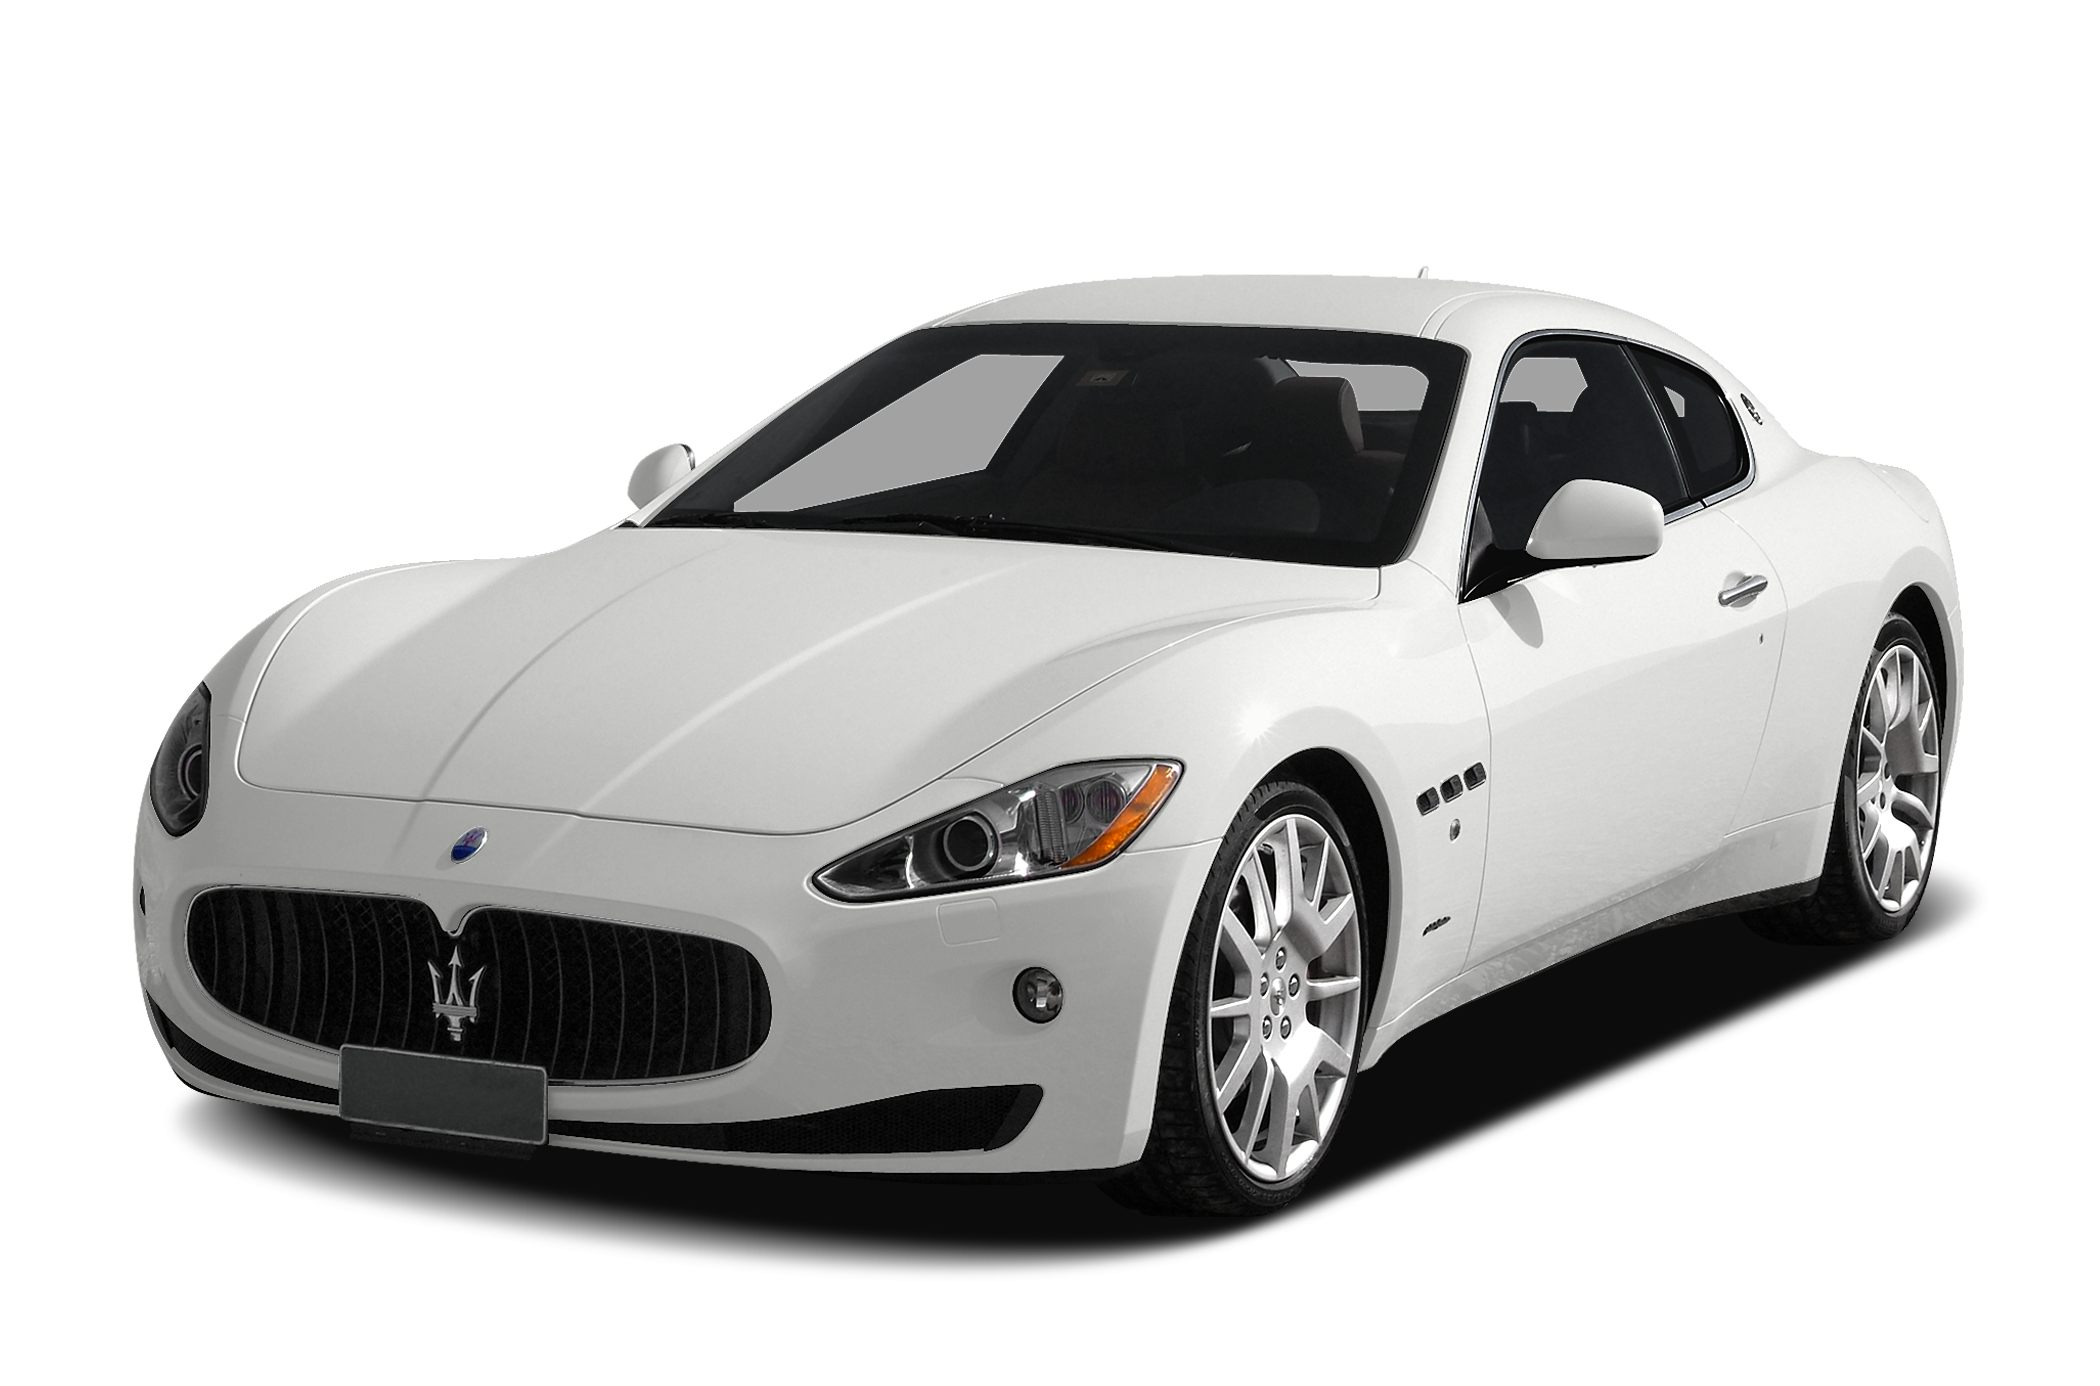 Maserati recalls 2008-10 Granturismo over potential ...